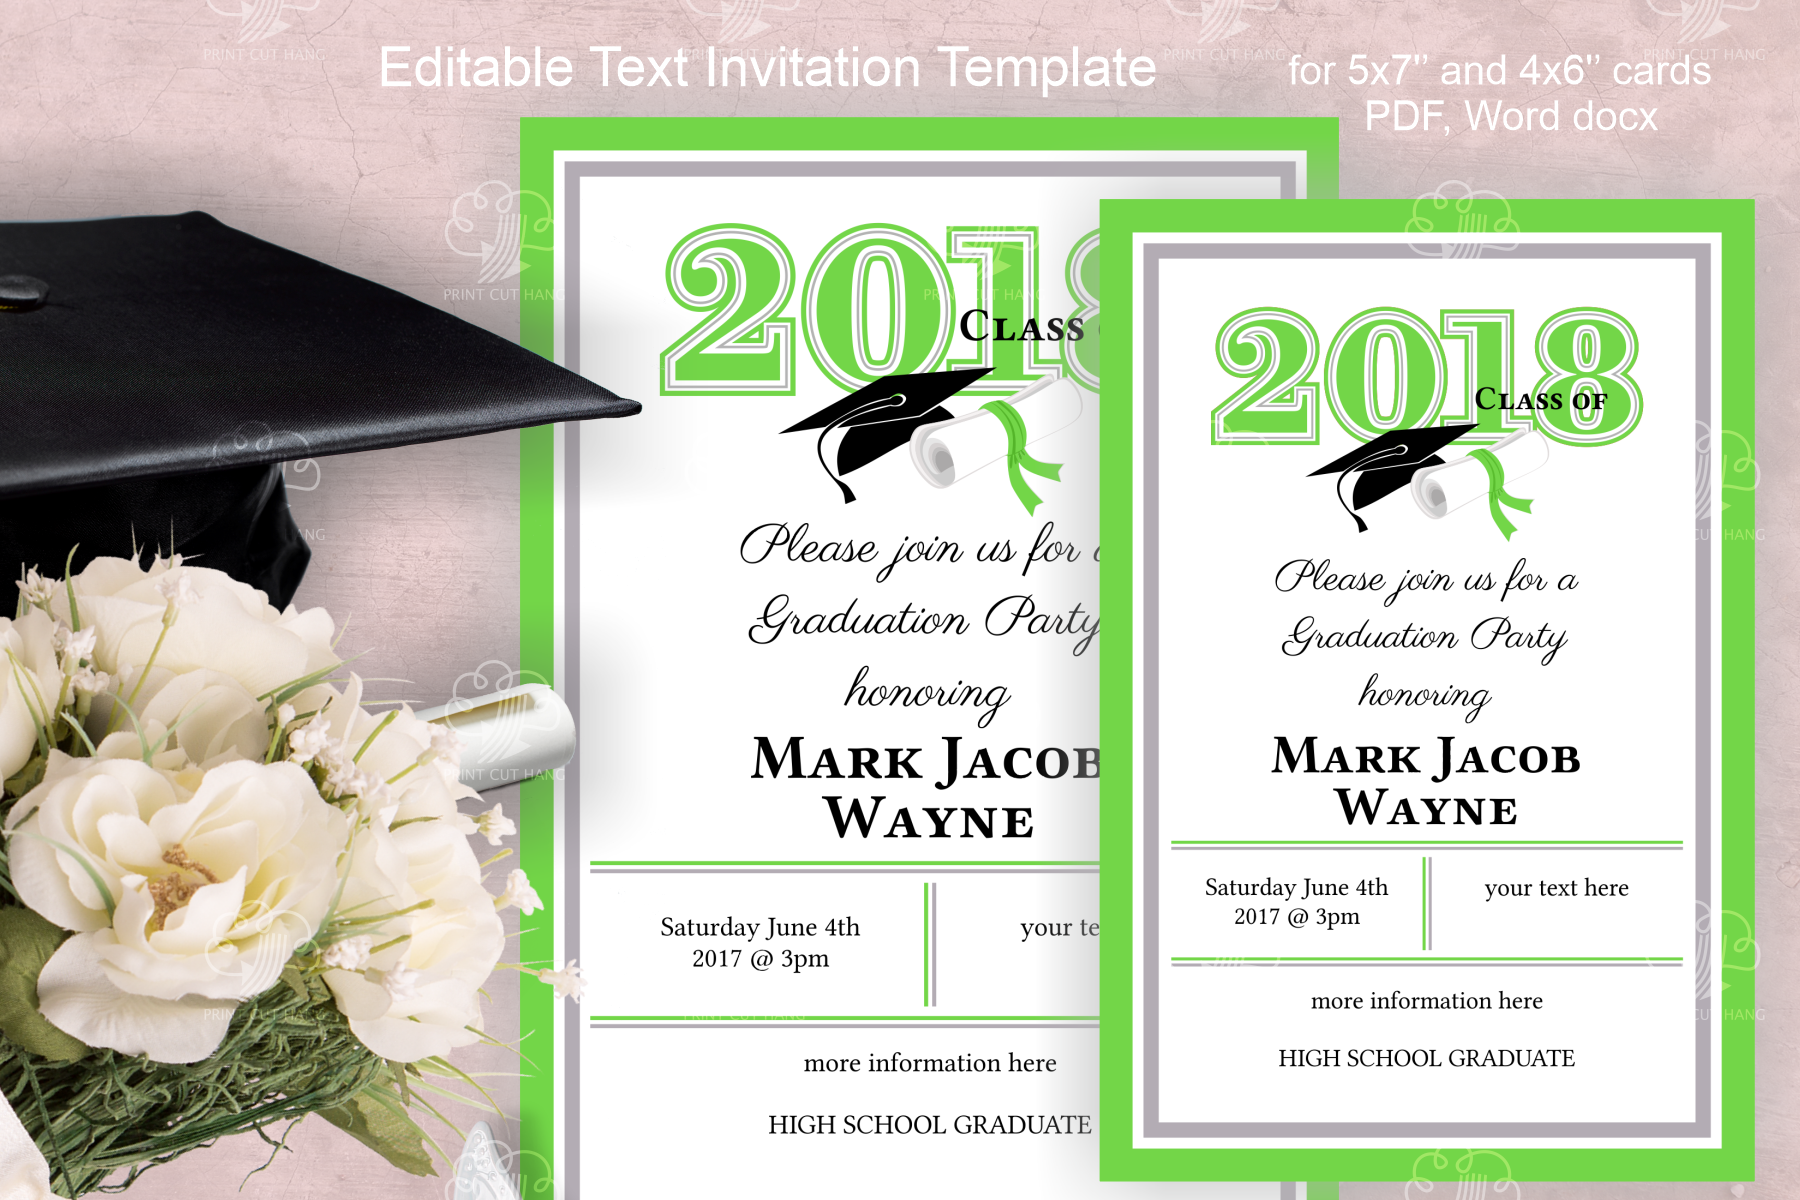 invitation template editable text  green  graduation 2019